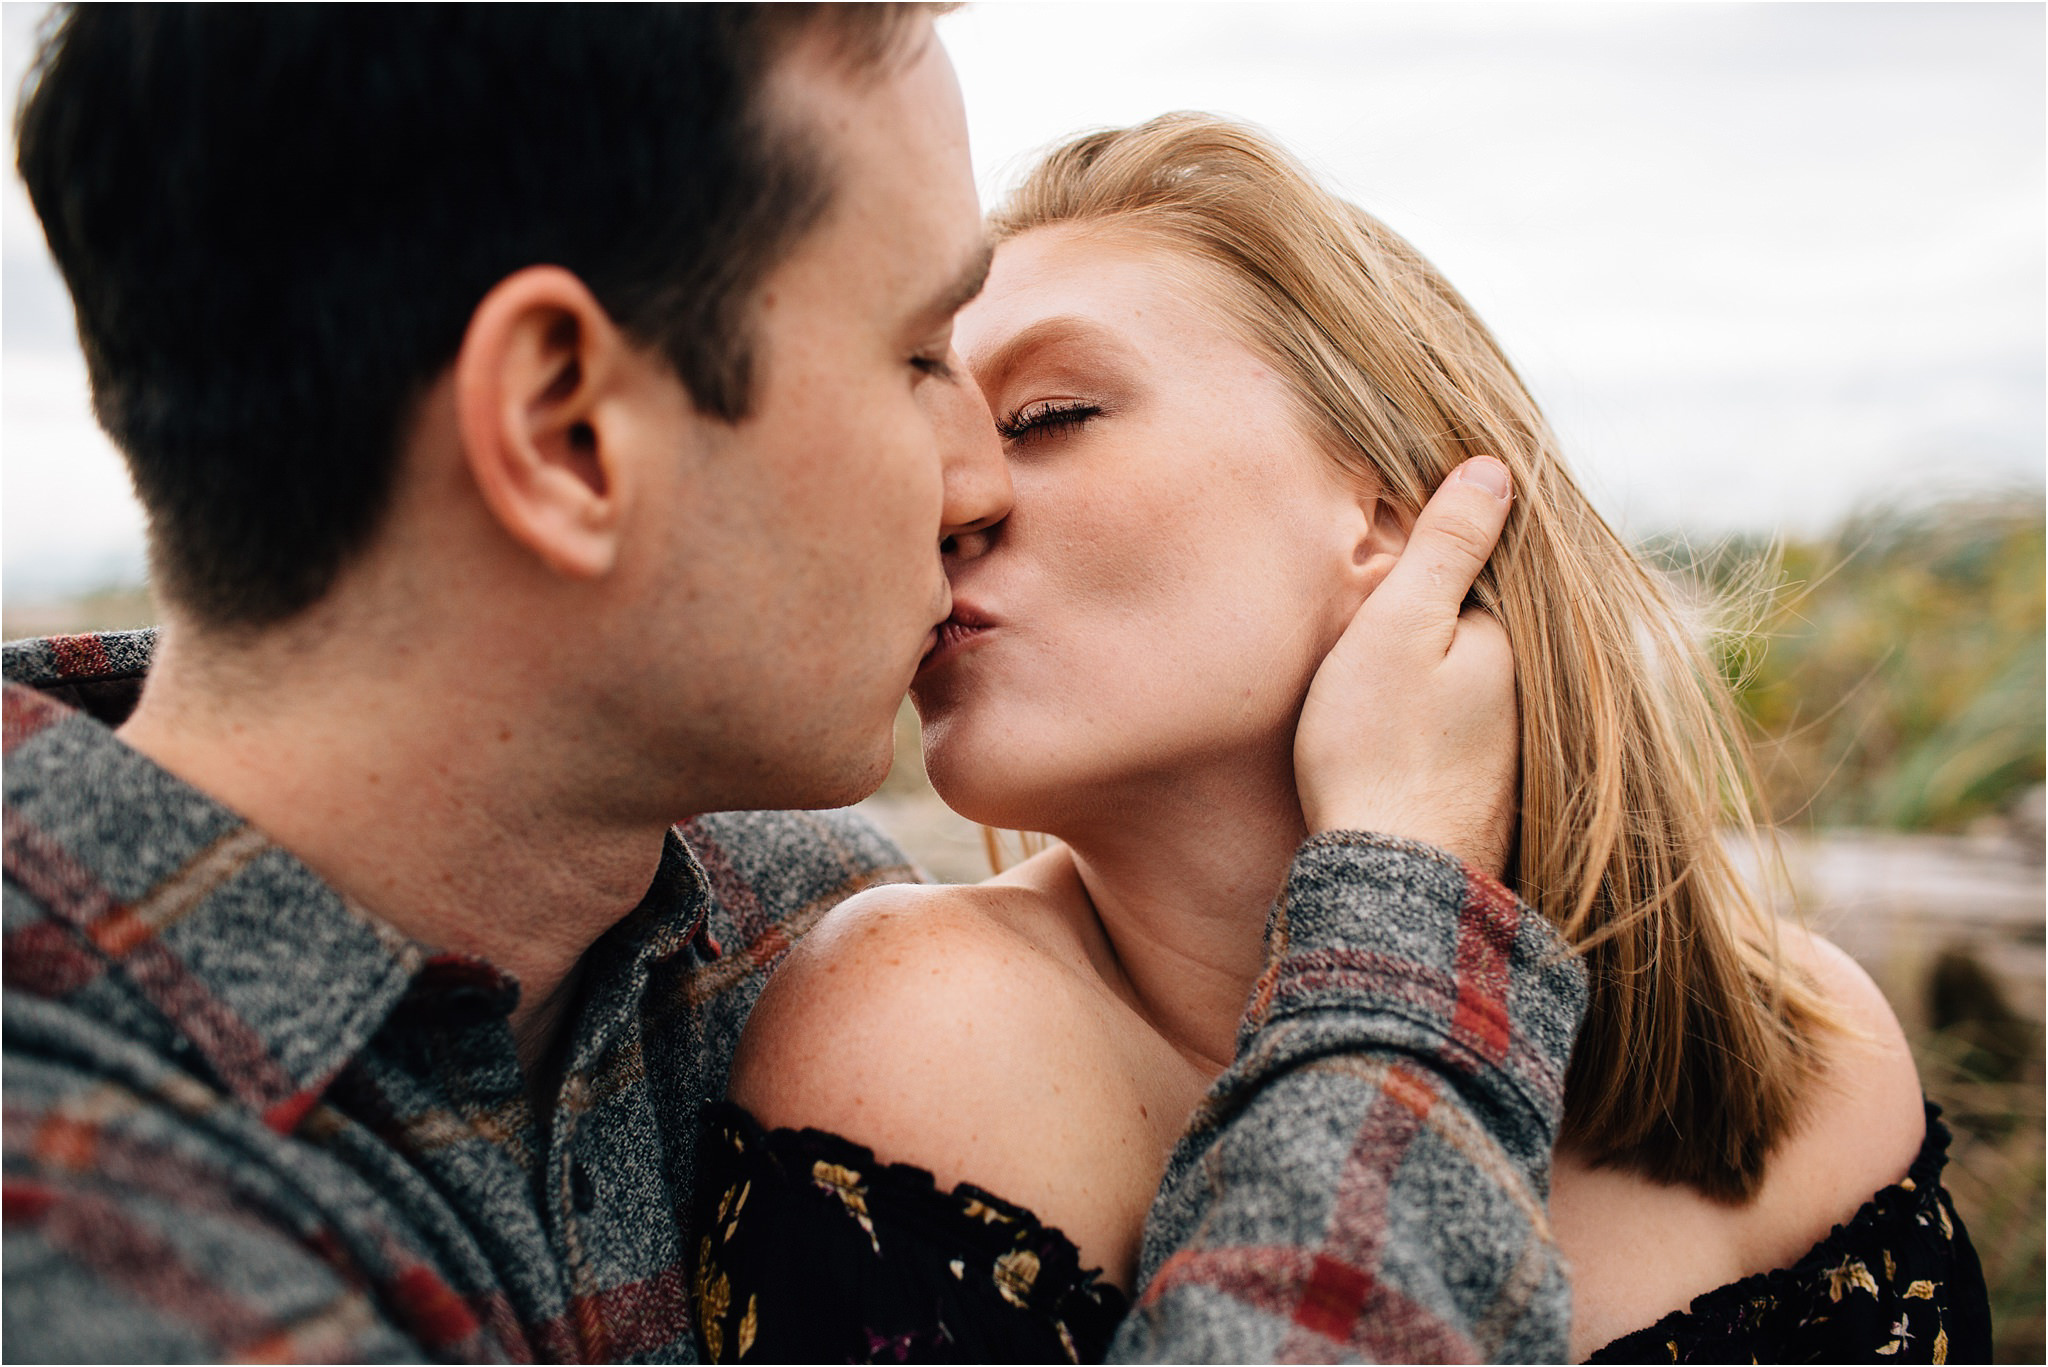 oak-harbor-couples-photographer-deception-pass-24.jpg